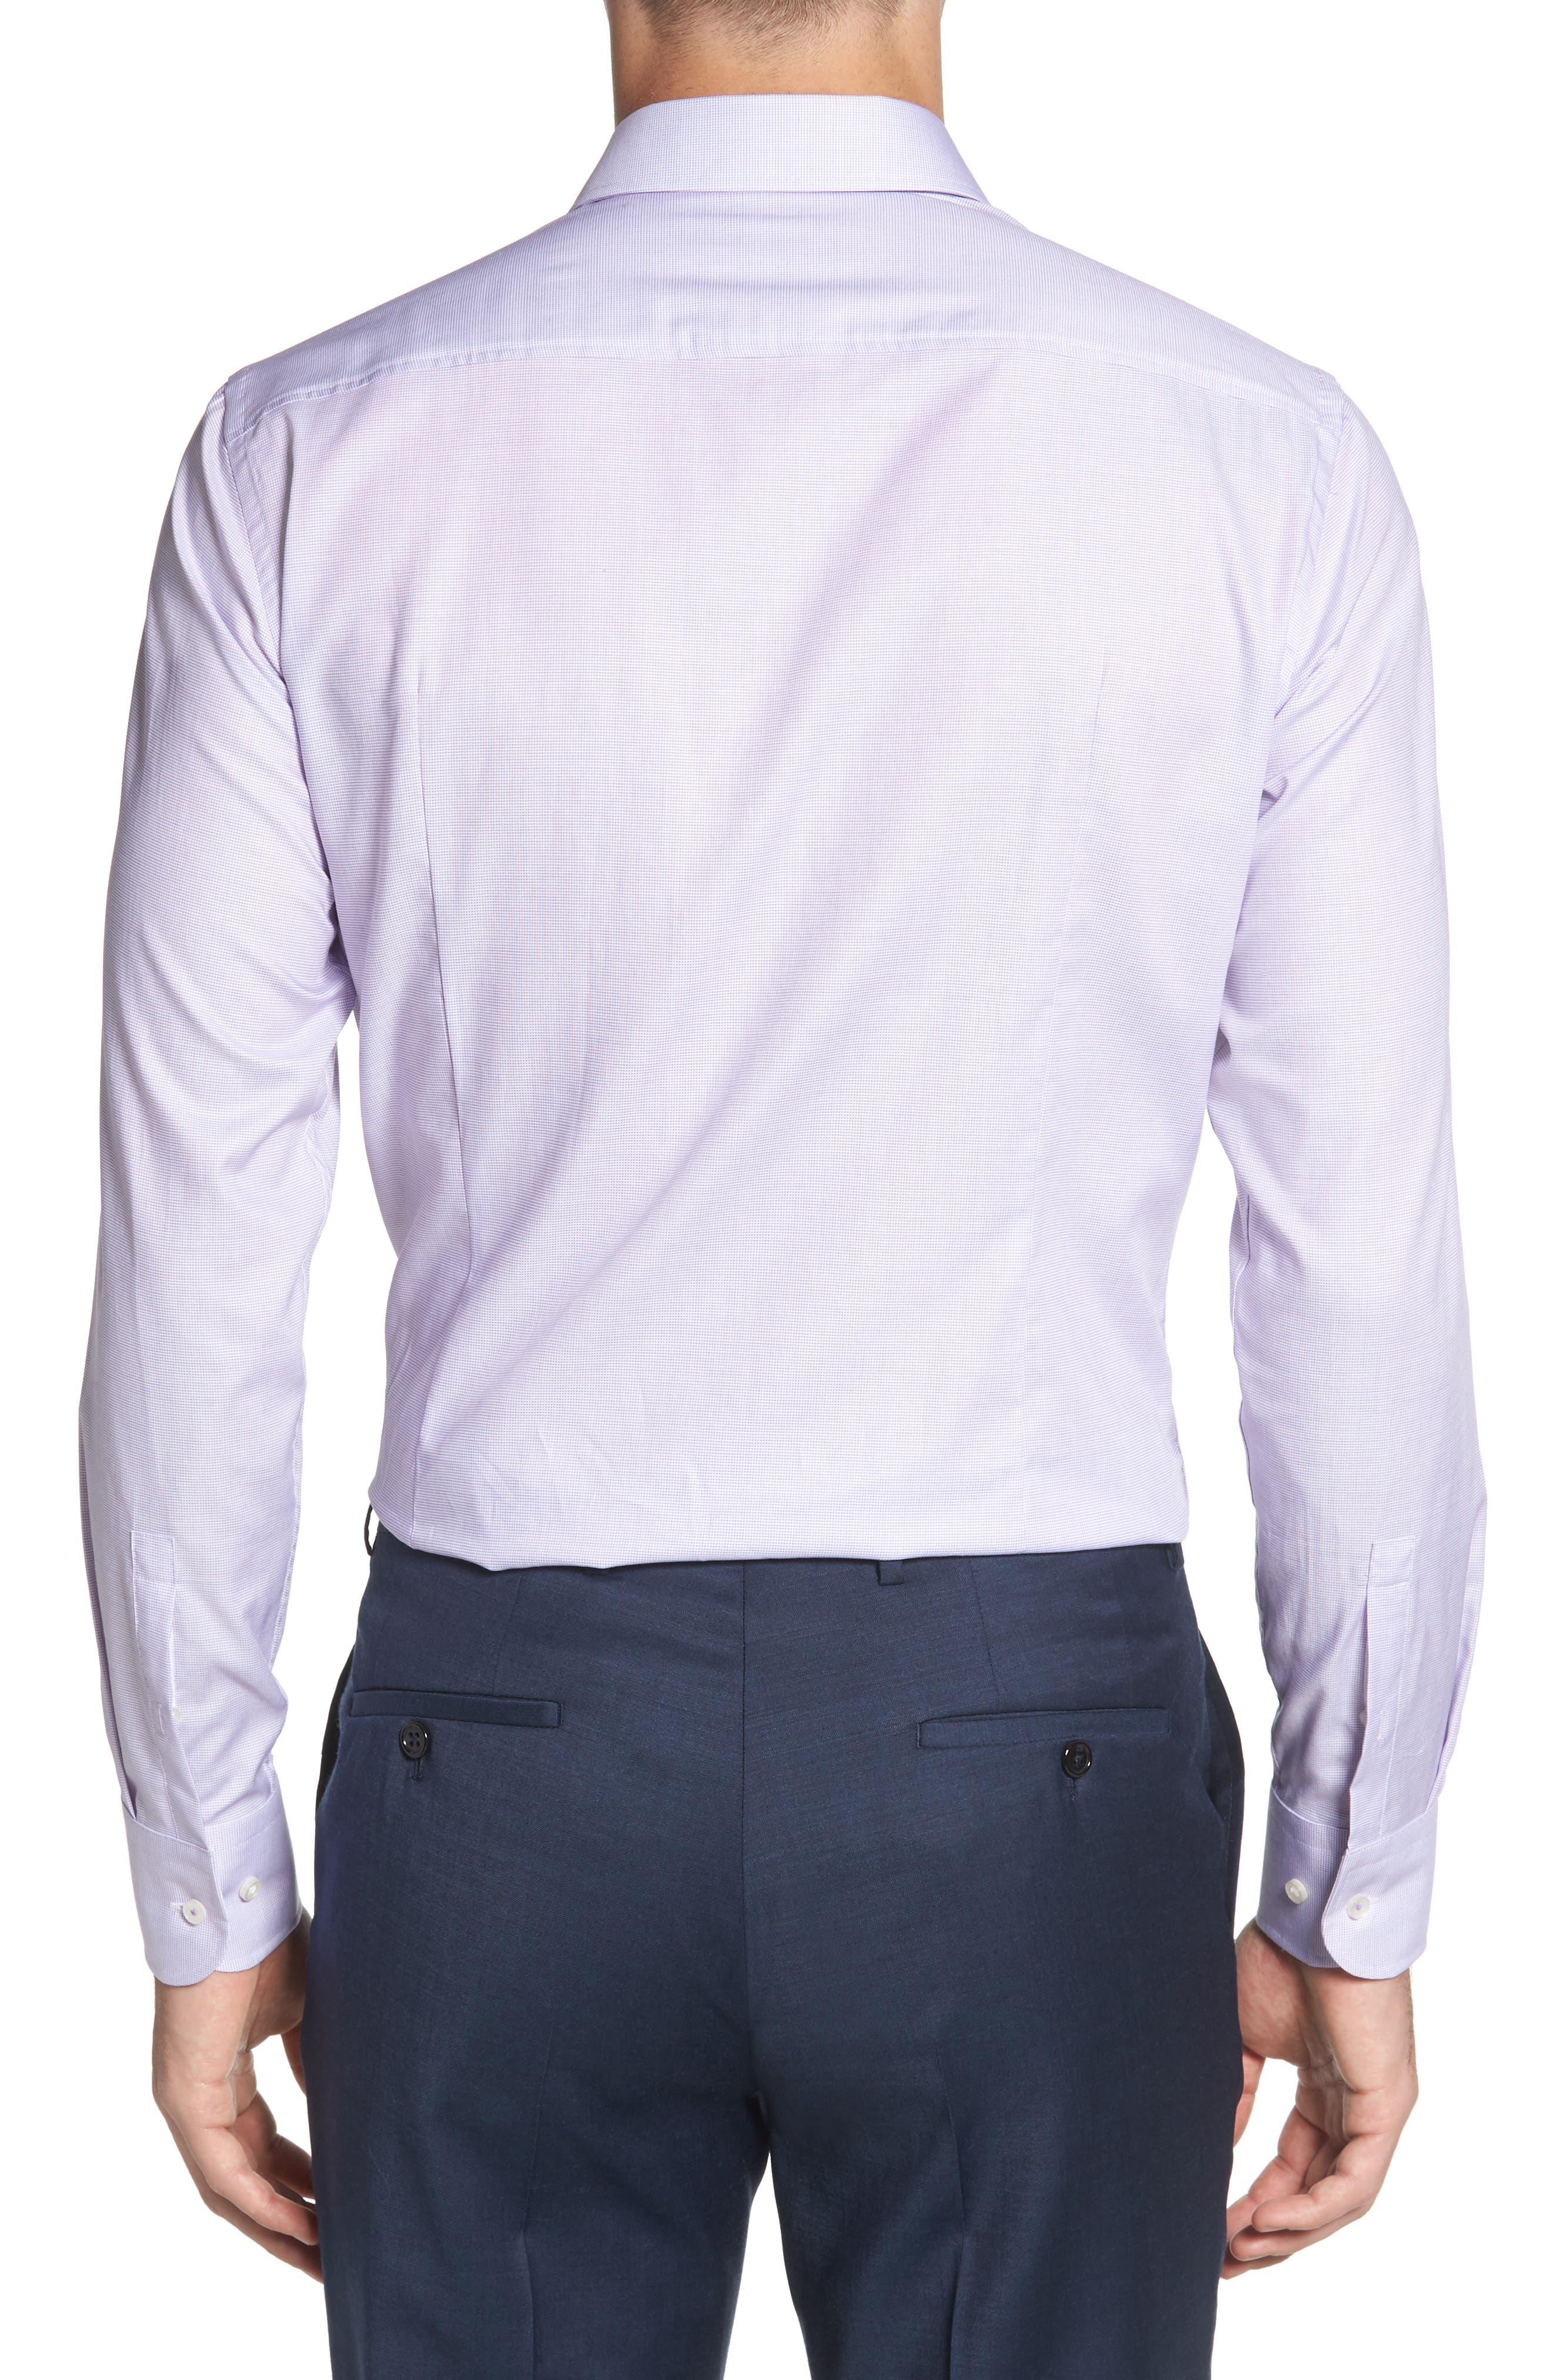 Jesse Slim Fit Dress Shirt,                             Alternate thumbnail 3, color,                             512